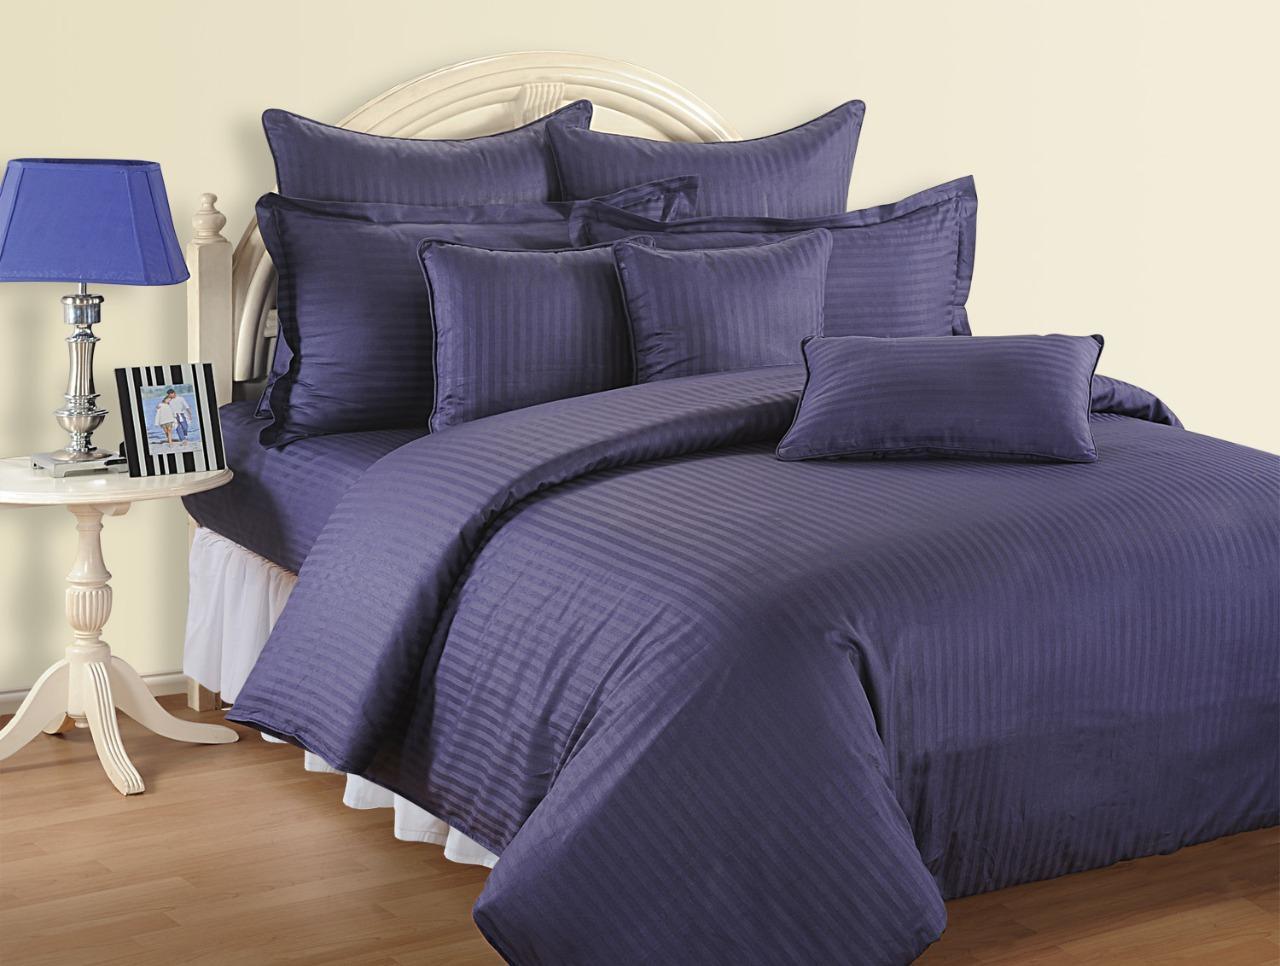 4 pcs sateen 500tc queen cotton stripy duvet quilt cover set fitted bed sheet ebay. Black Bedroom Furniture Sets. Home Design Ideas